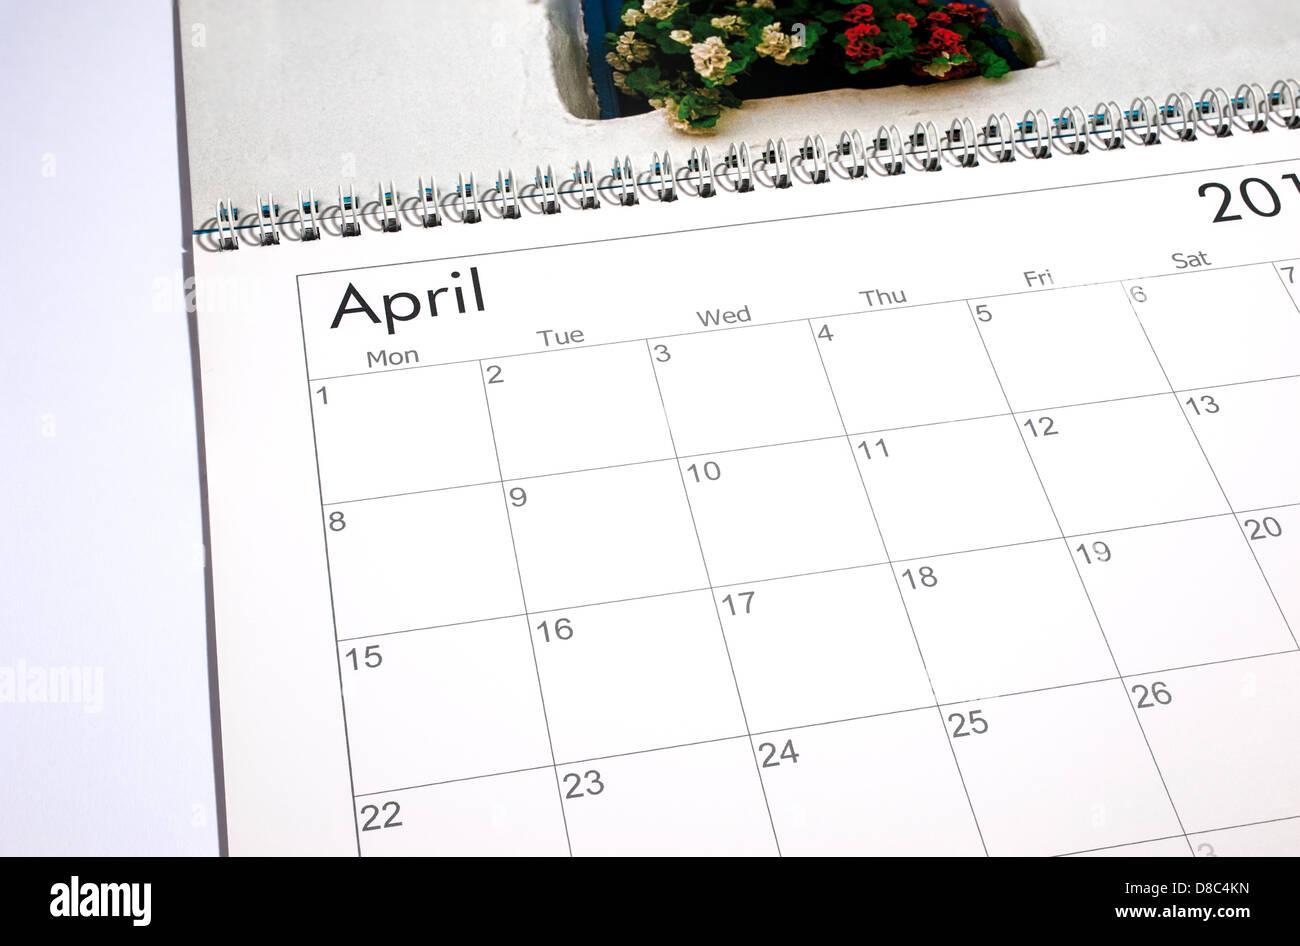 Blank calendar page - April 2013 - Stock Image